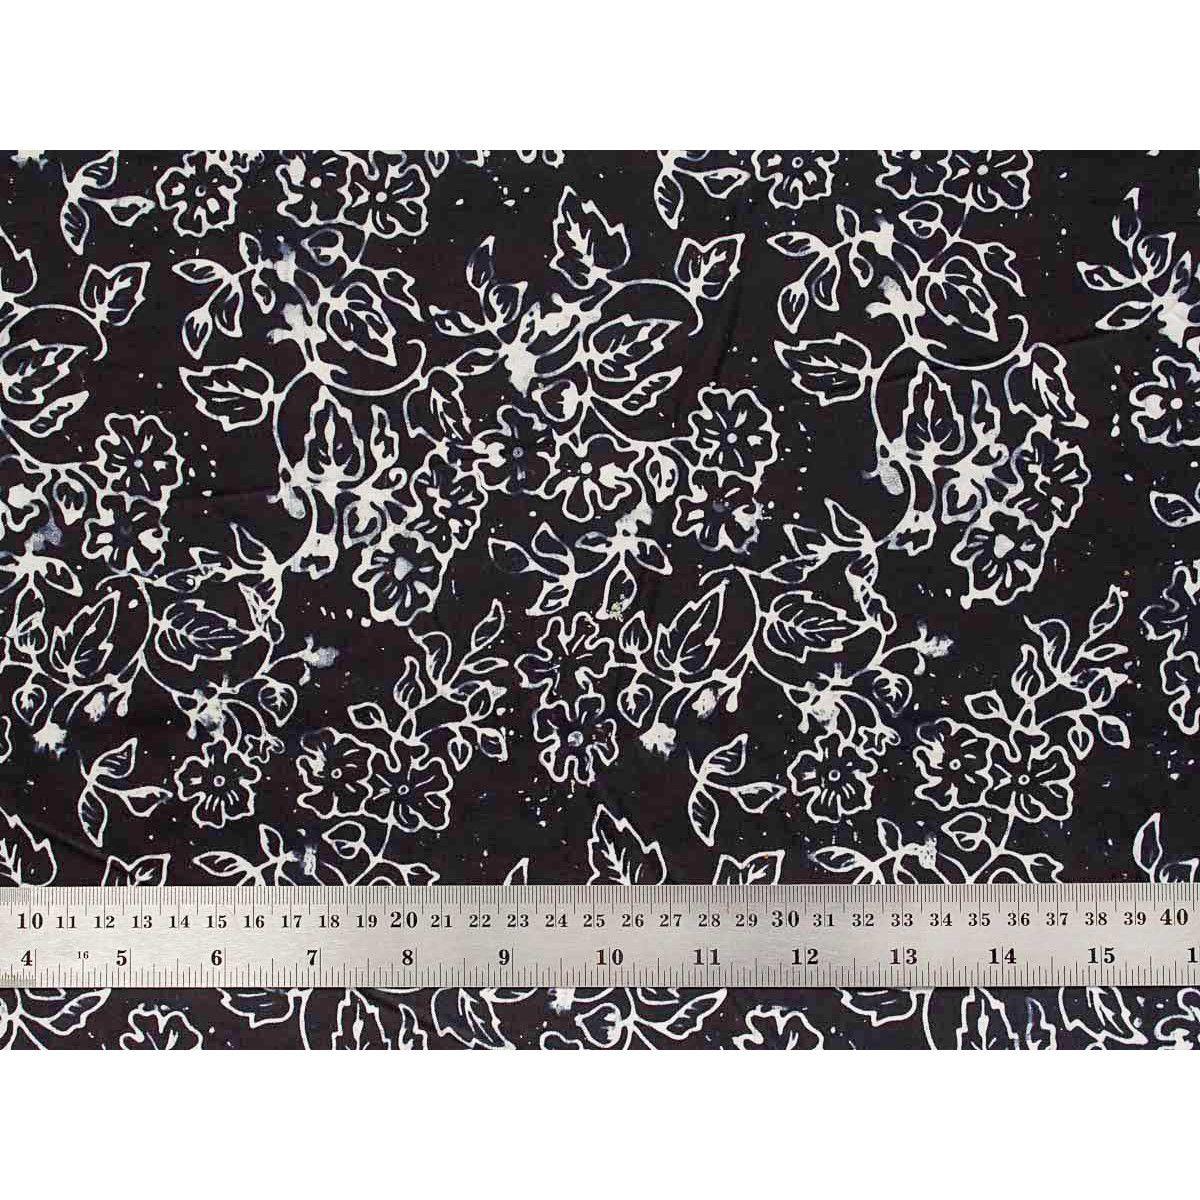 Tissu patchwork noir et blanc motif capucines